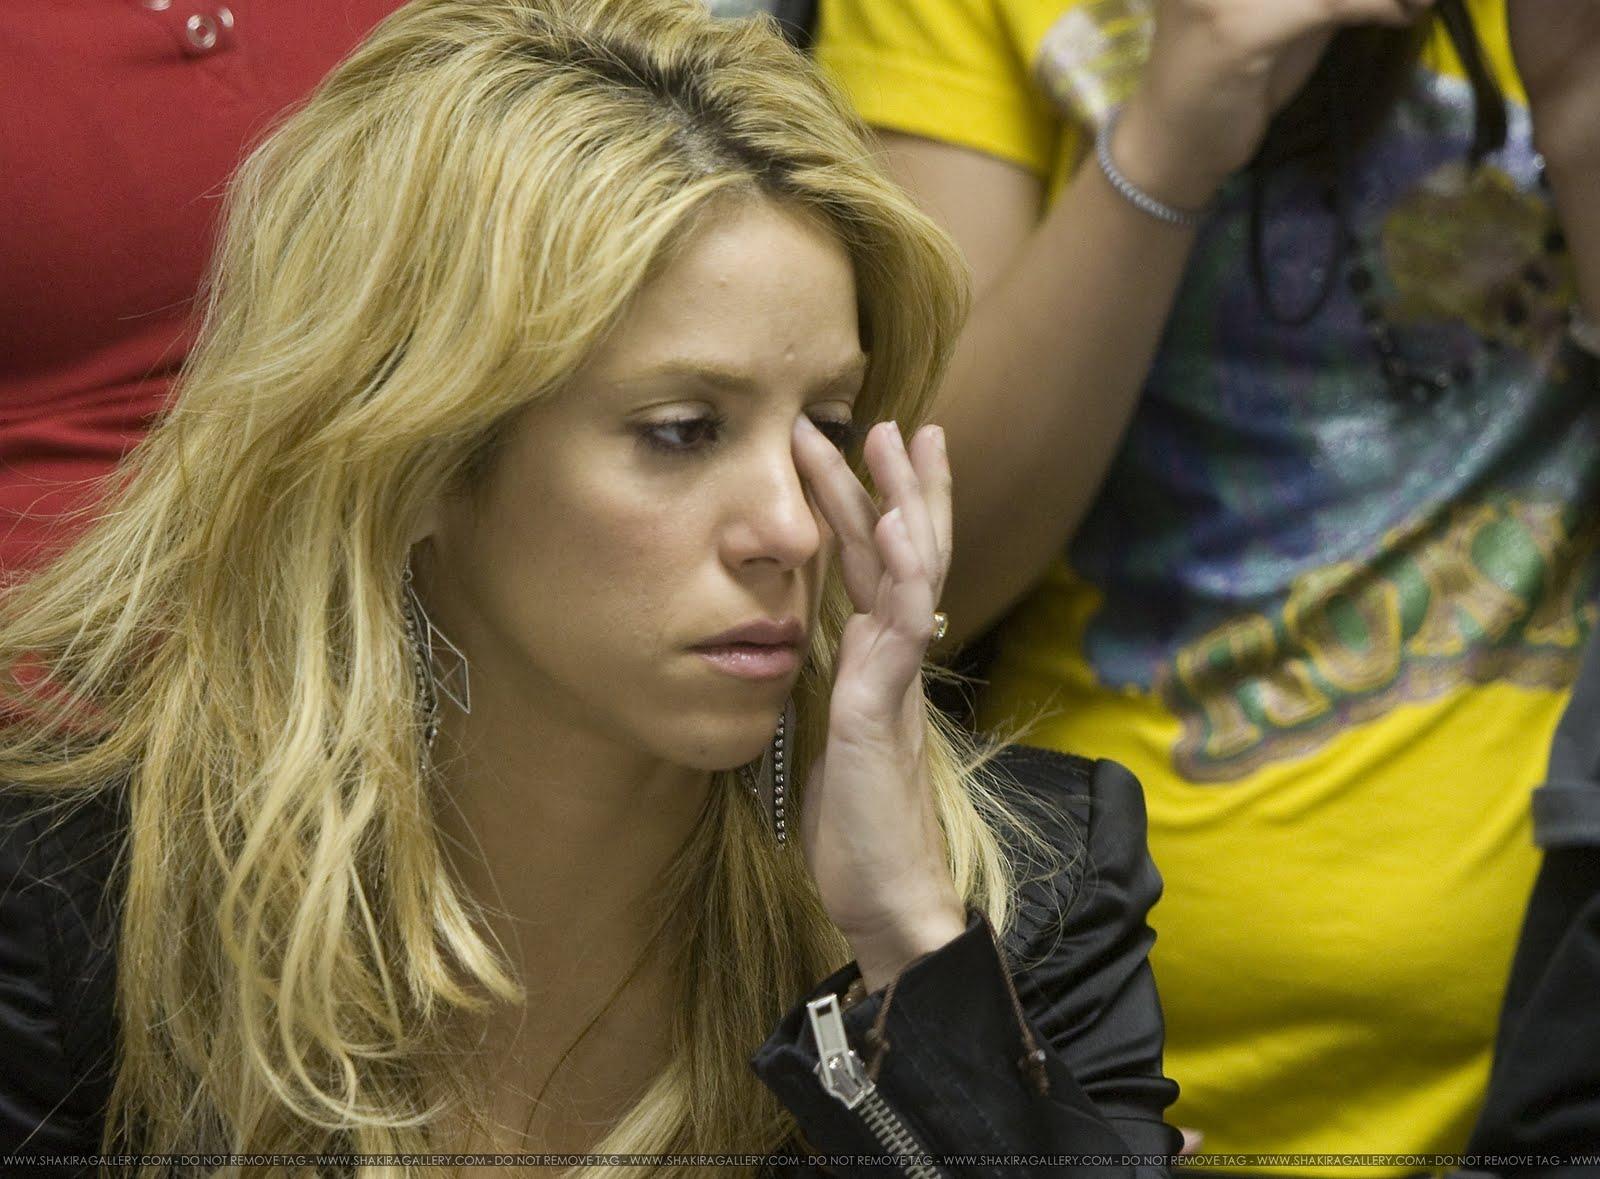 http://4.bp.blogspot.com/-MDabCaaUcaQ/UE89XuJ5fFI/AAAAAAAAG_s/5446KntodI4/s1600/Abogado-+de+-Shakira-+dice+-que+De+la+R%C3%BAa+s%C3%AD+la+tiene+demandada.jpg